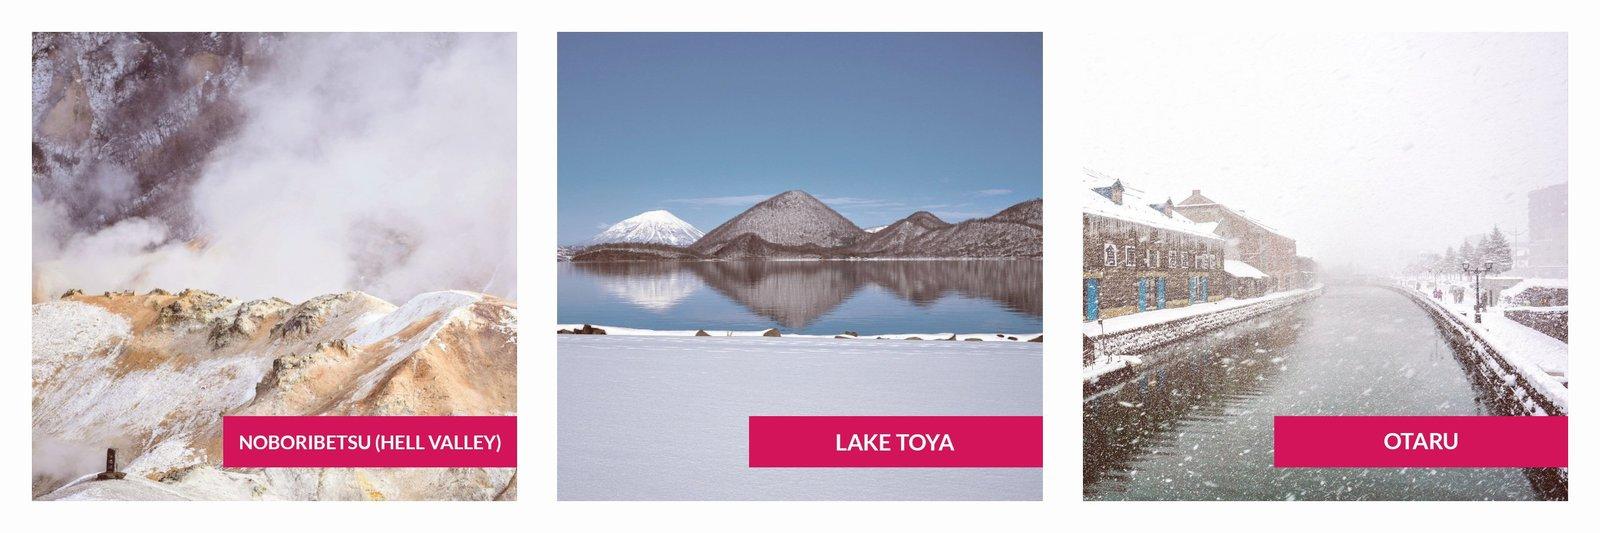 Winter Daytour (Noboribetsu - Lake Toya - Otaru)